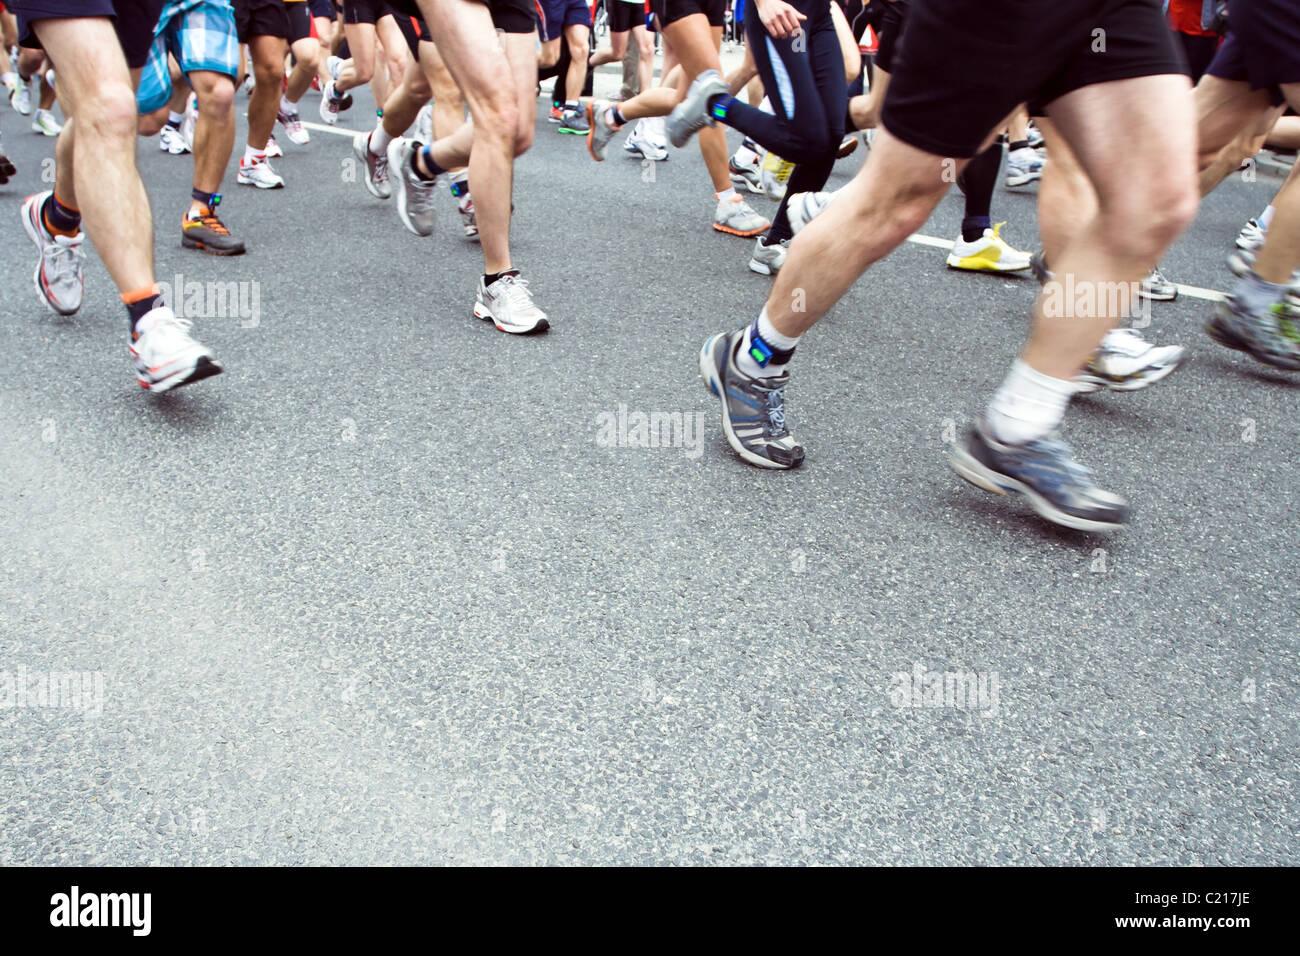 Runners running in city marathon, motion blur on legs - Stock Image